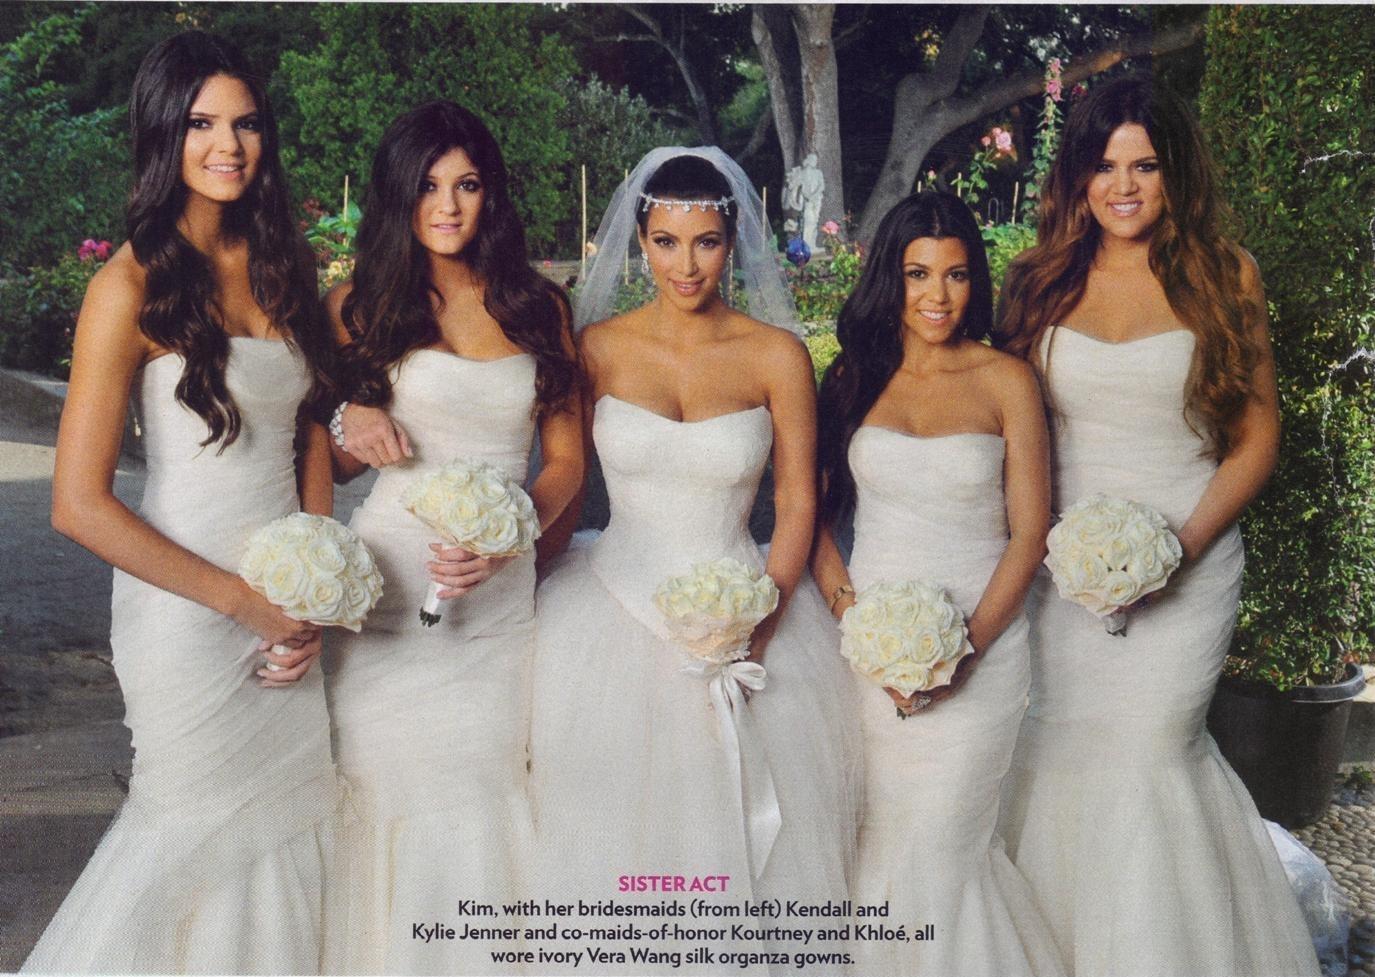 Kardashian bridesmaid dresses choice image braidsmaid dress kim kardashian people magazine wedding edition hq scans keeping up kim kardashian people magazine wedding edition ombrellifo Image collections